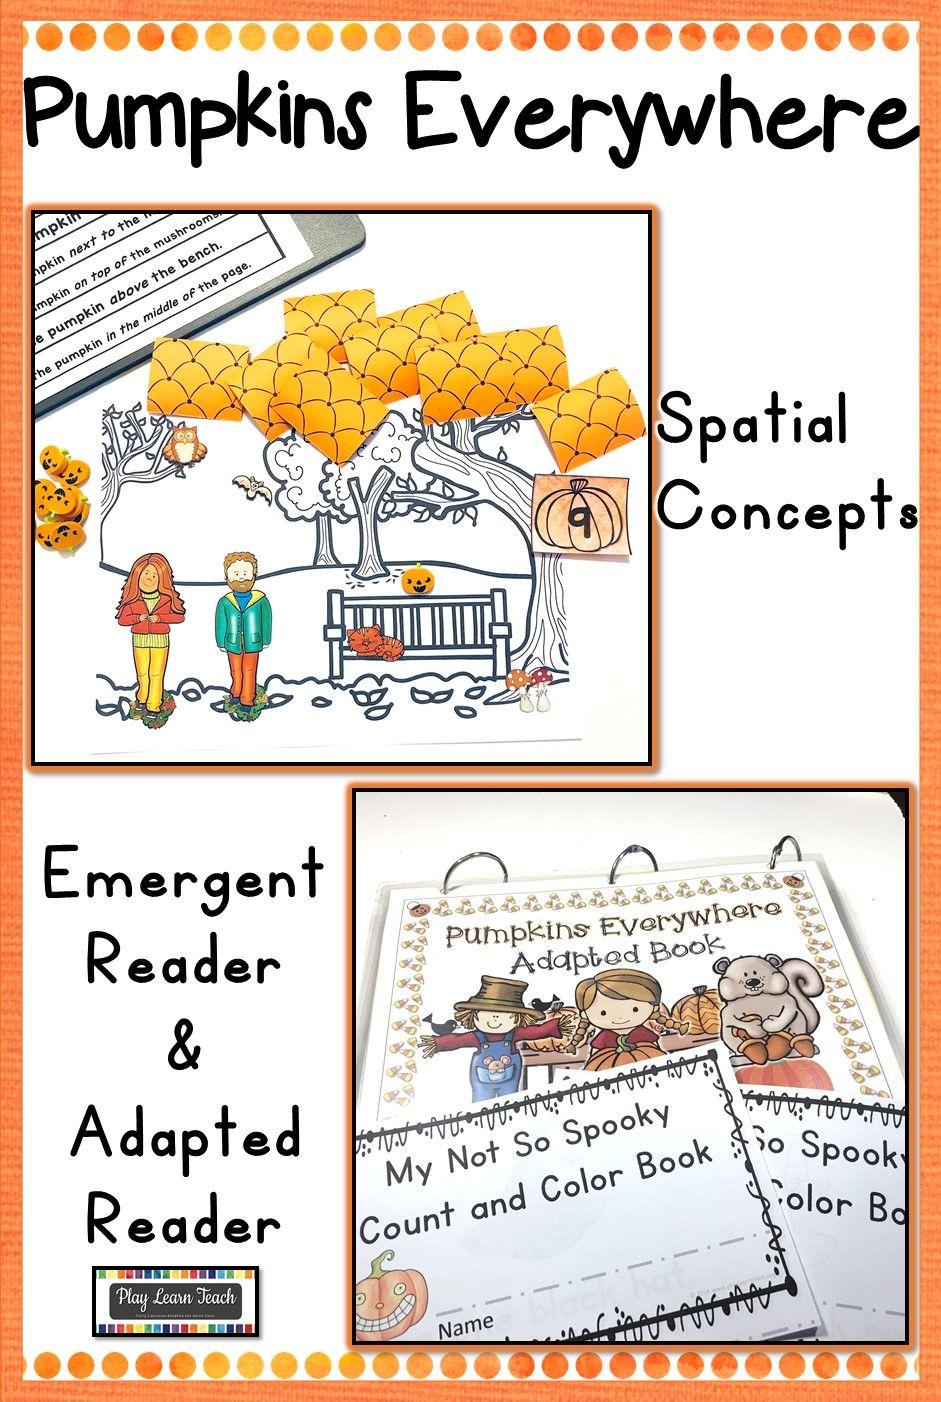 Pumpkins Adapted Reader Spatial Concepts Life Skills Curriculum Adapted Books [ 1402 x 941 Pixel ]